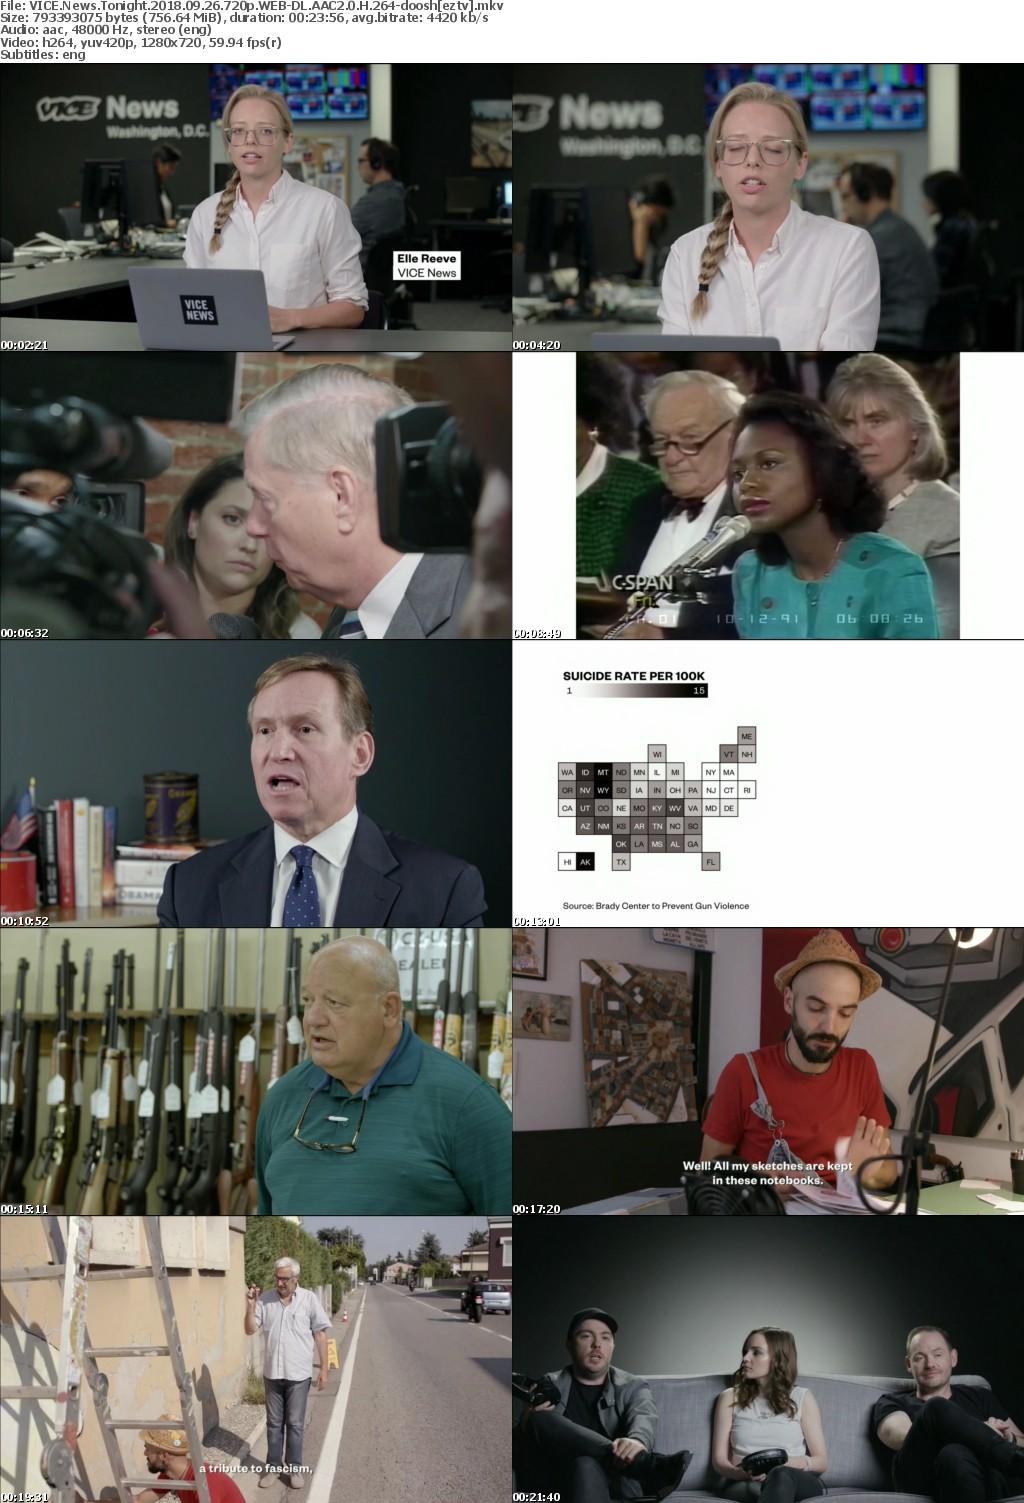 VICE News Tonight 2018 09 26 720p WEB-DL AAC2 0 H 264-doosh